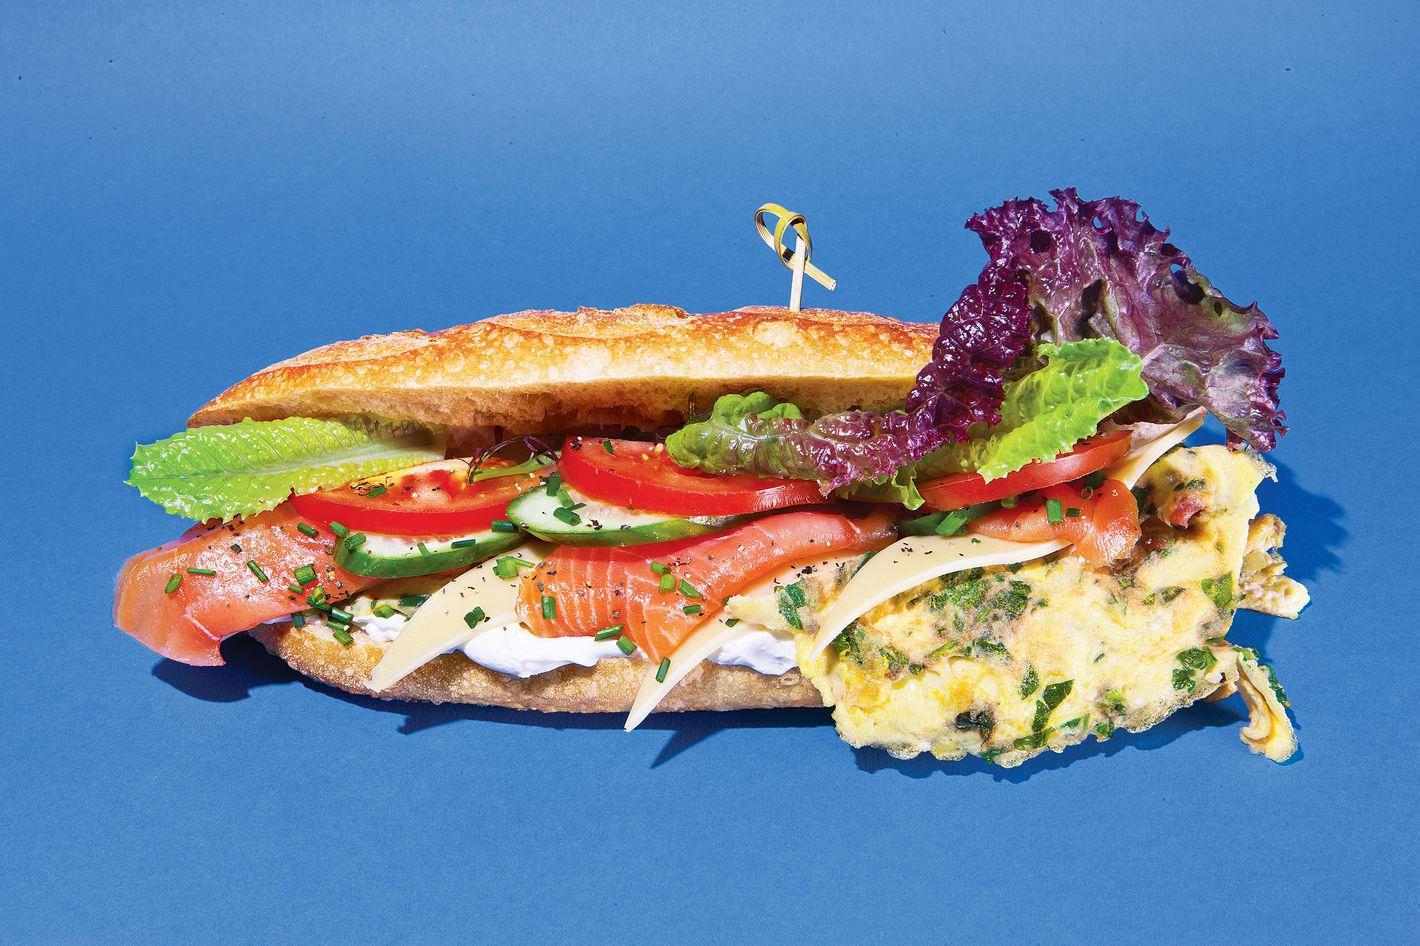 http://pixel.nymag.com/imgs/daily/grub/2013/06/28/28-cheap-eats-sandwich.jpg